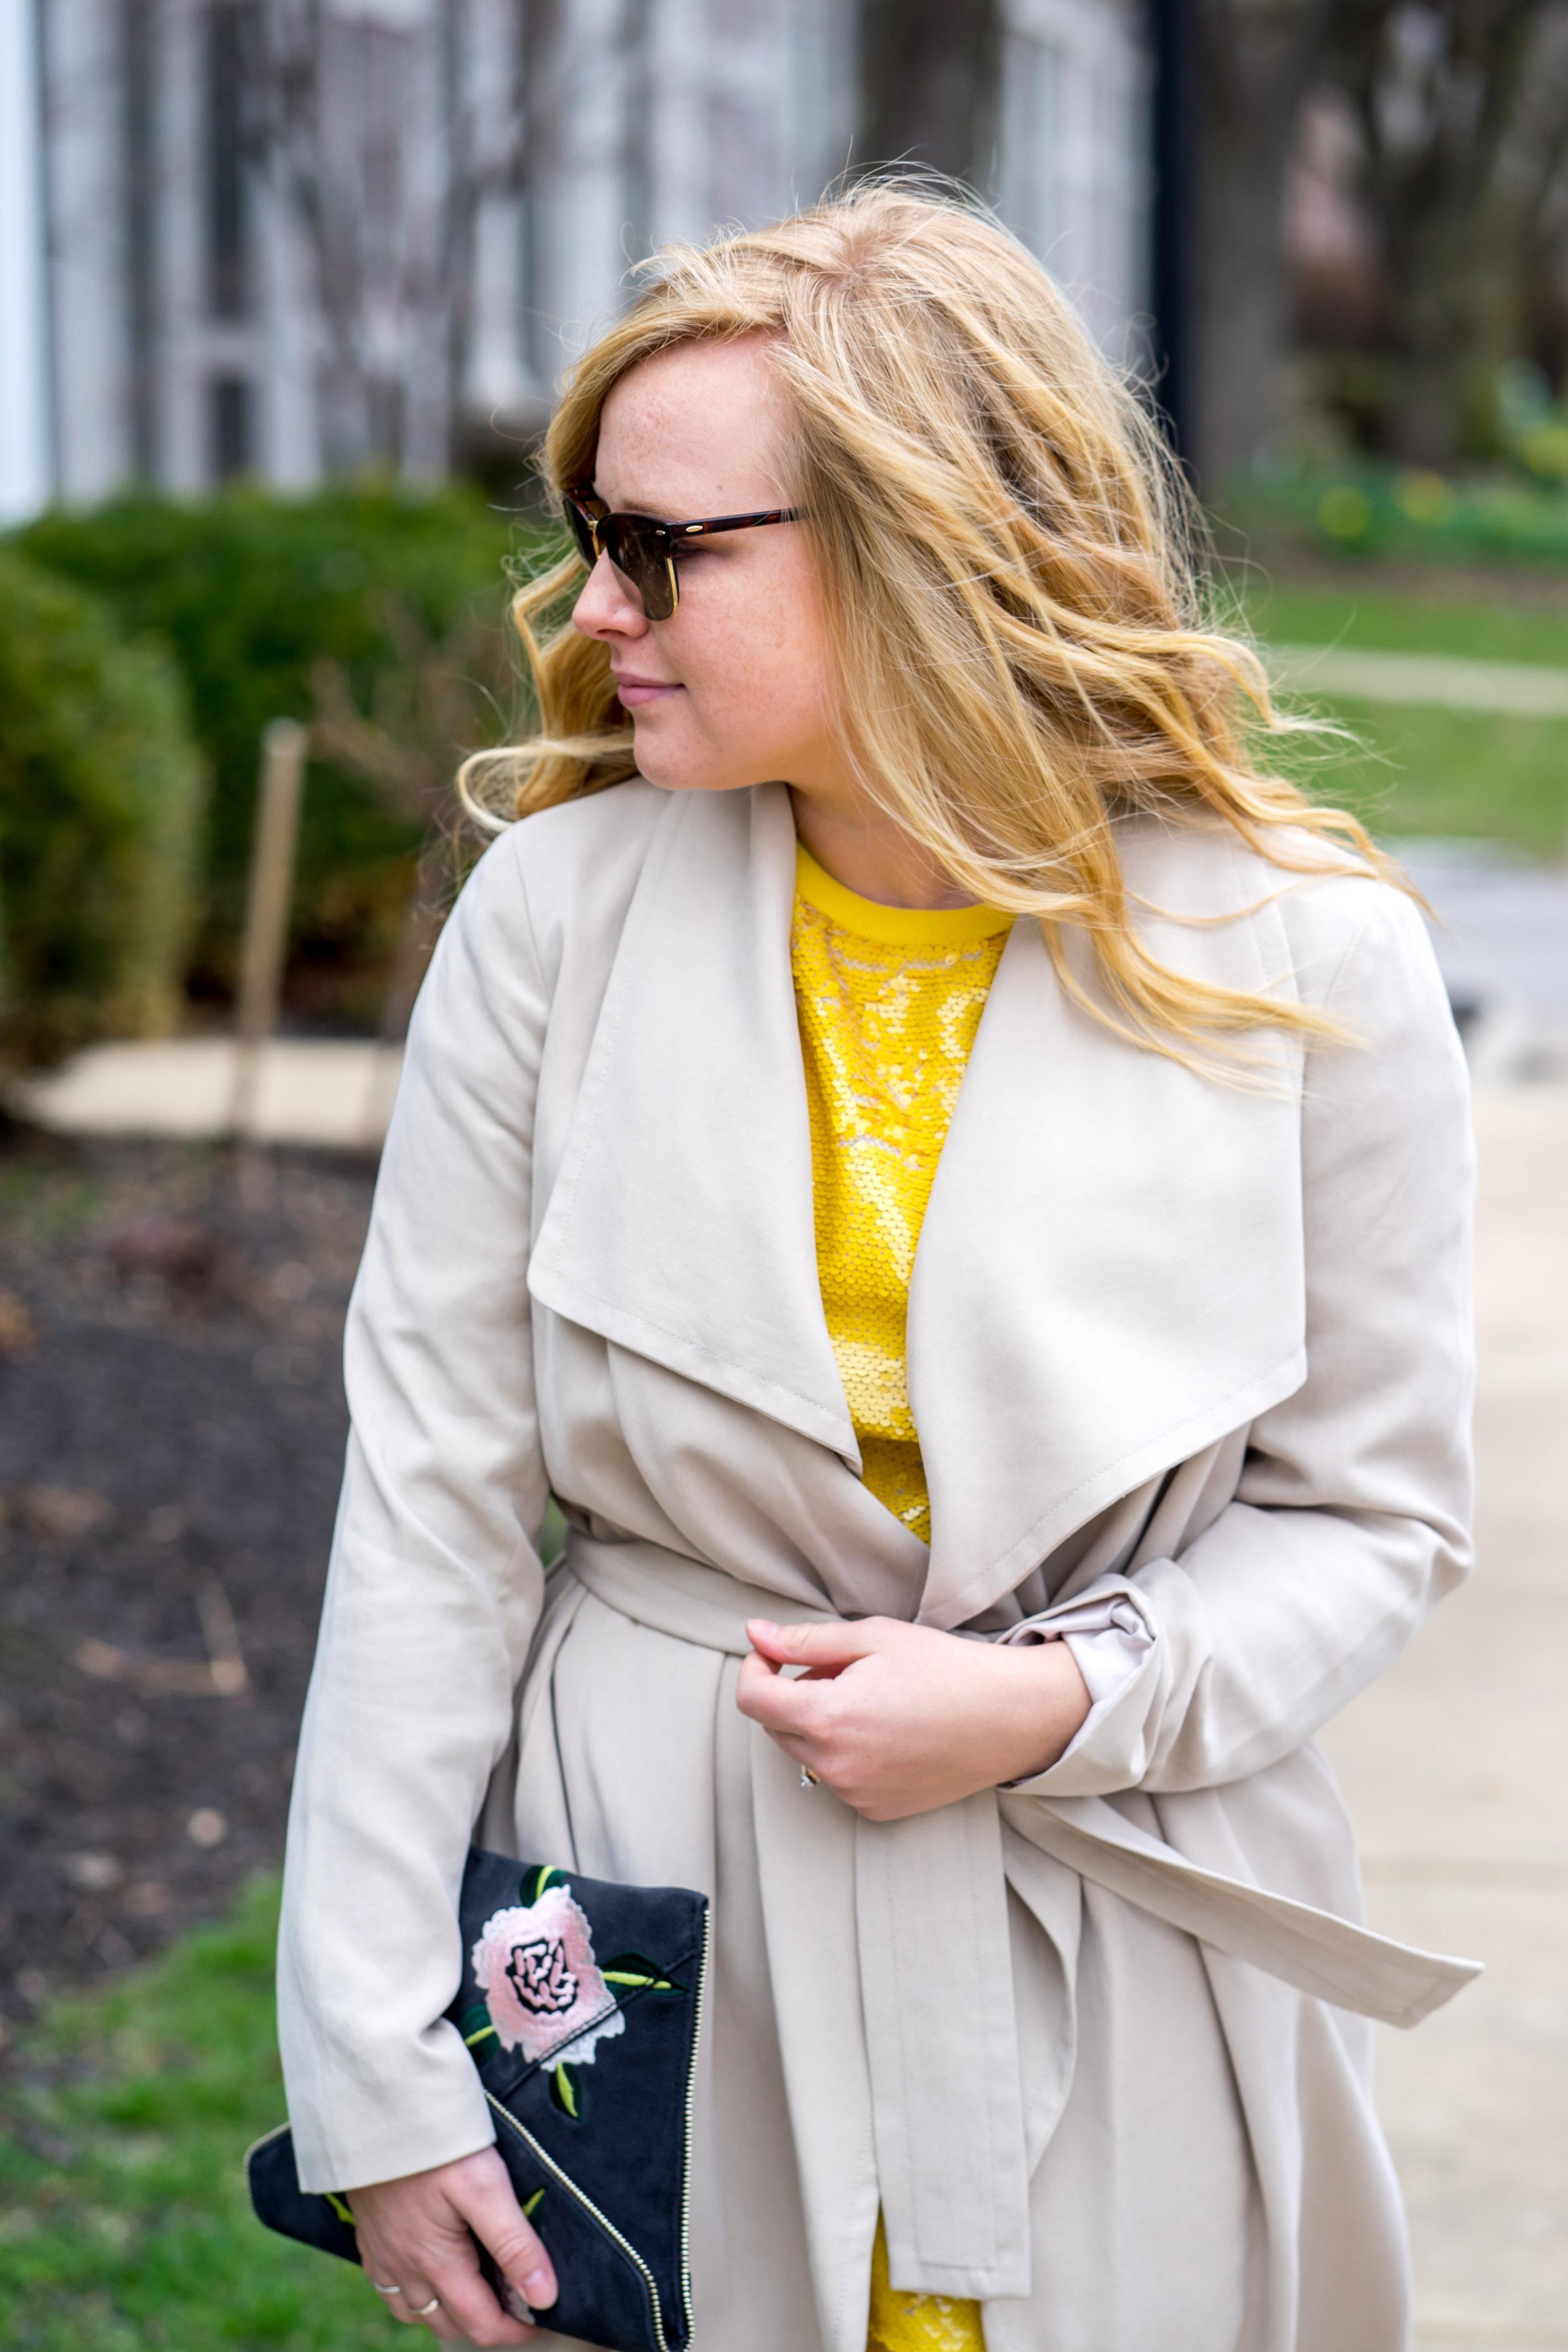 Maggie a la Mode - Be Bold Zara Yellow Sequin T Shirt Dress-5.jpg